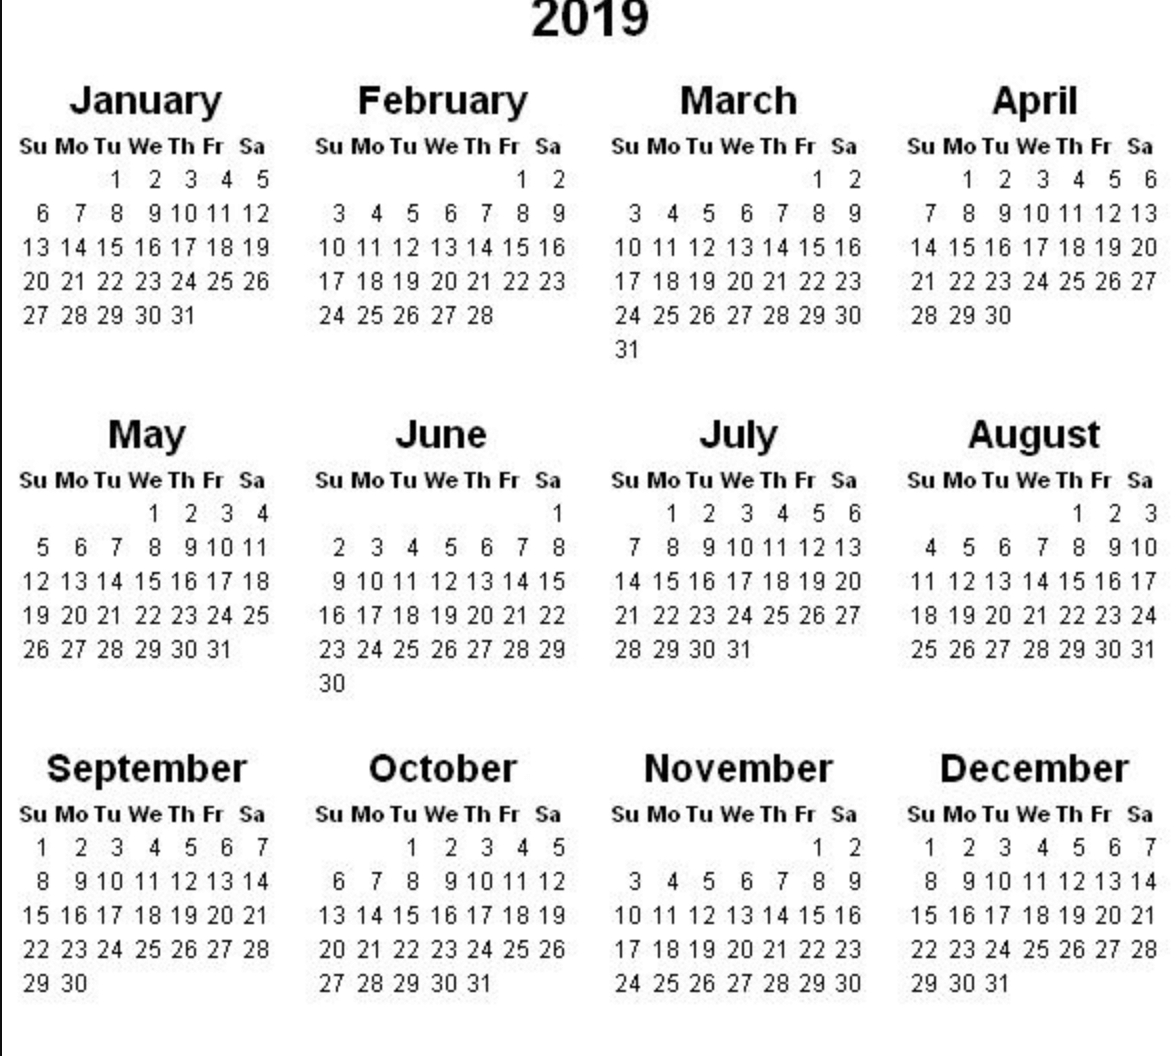 2019 Calendar - Amazonaws